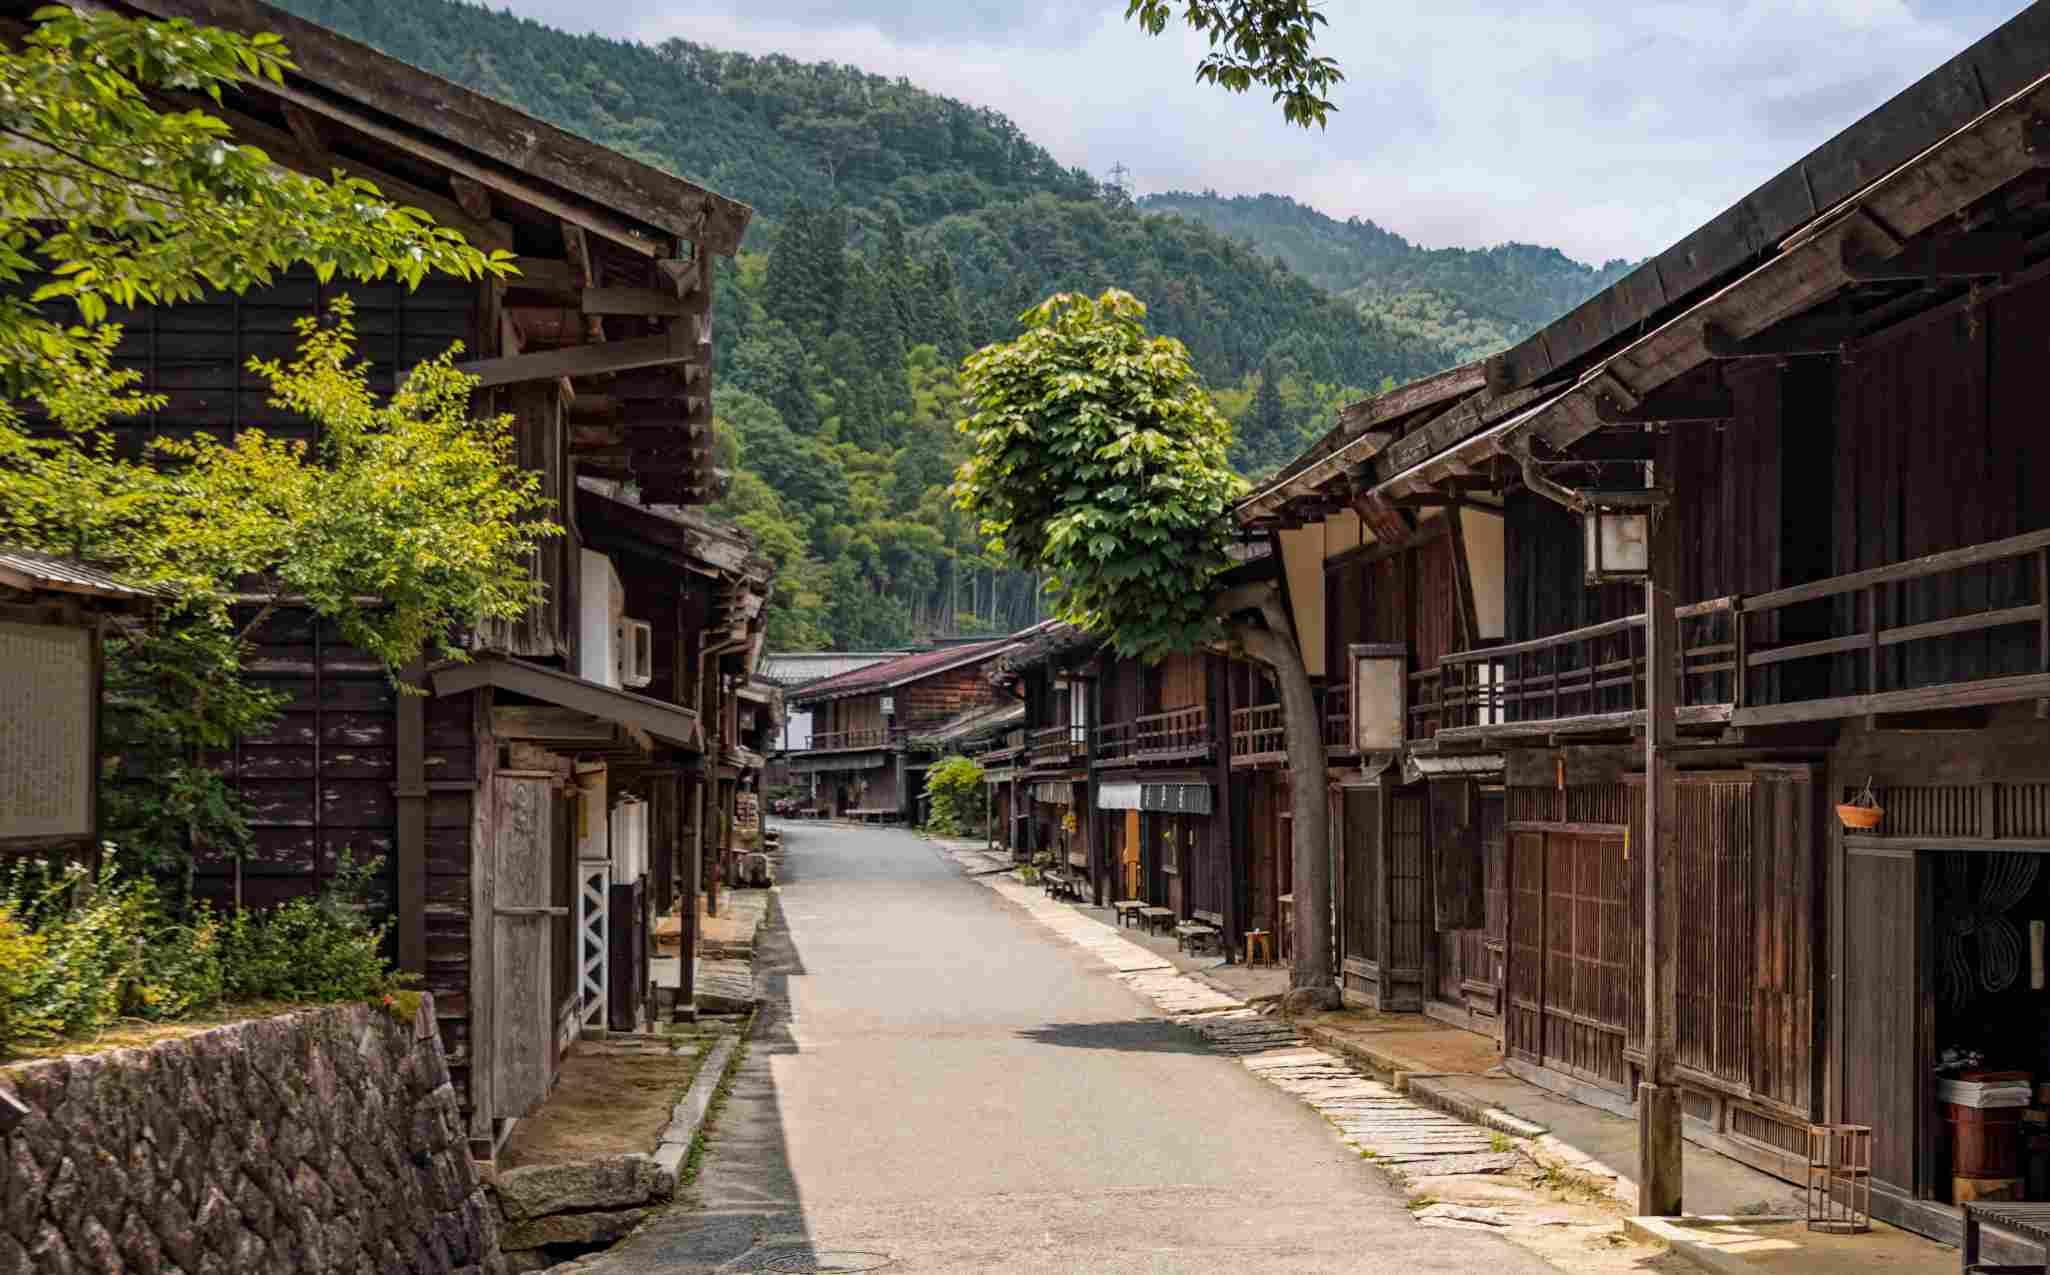 Post Town Tsumago